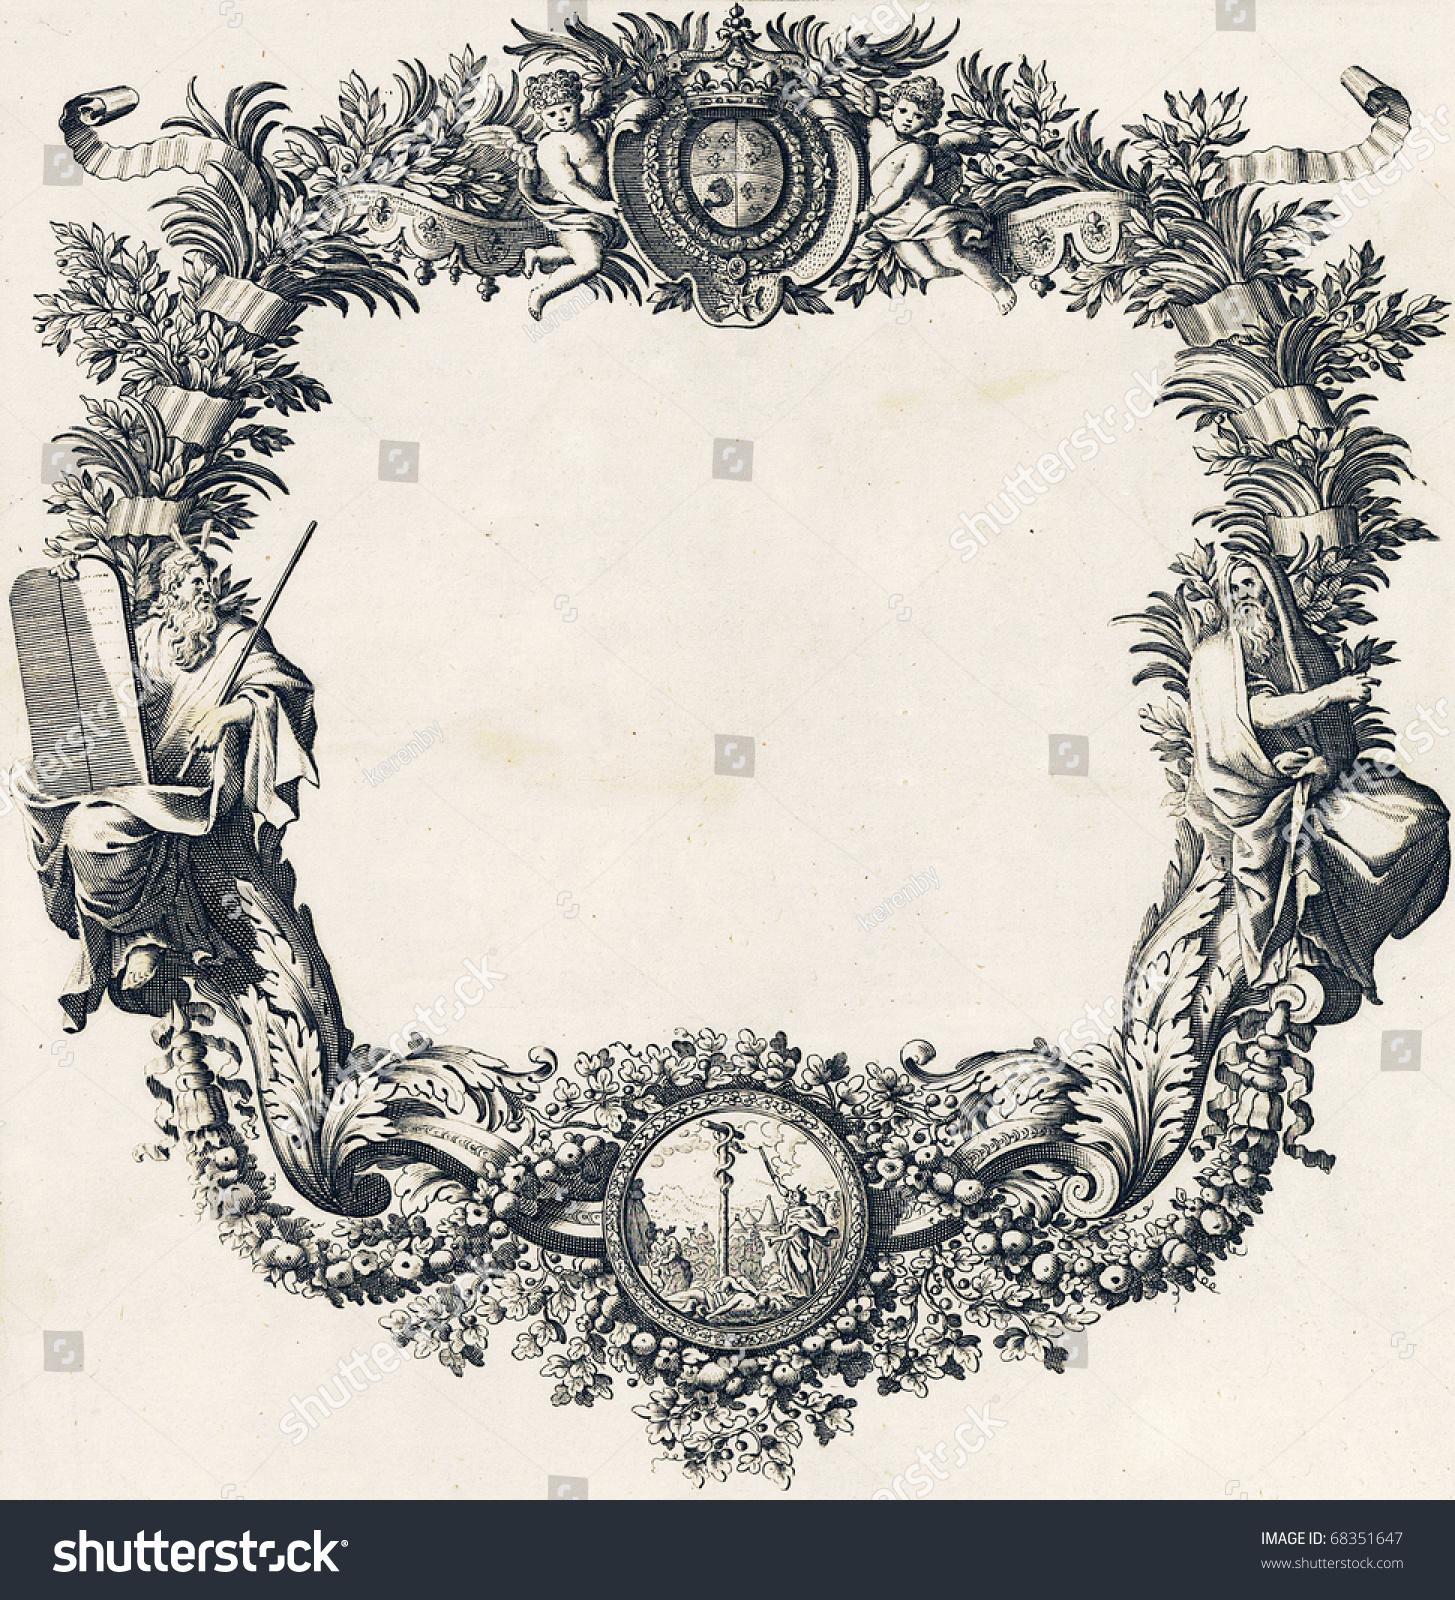 Engravings, Vintage Frame Design Stock Photo 68351647 ...